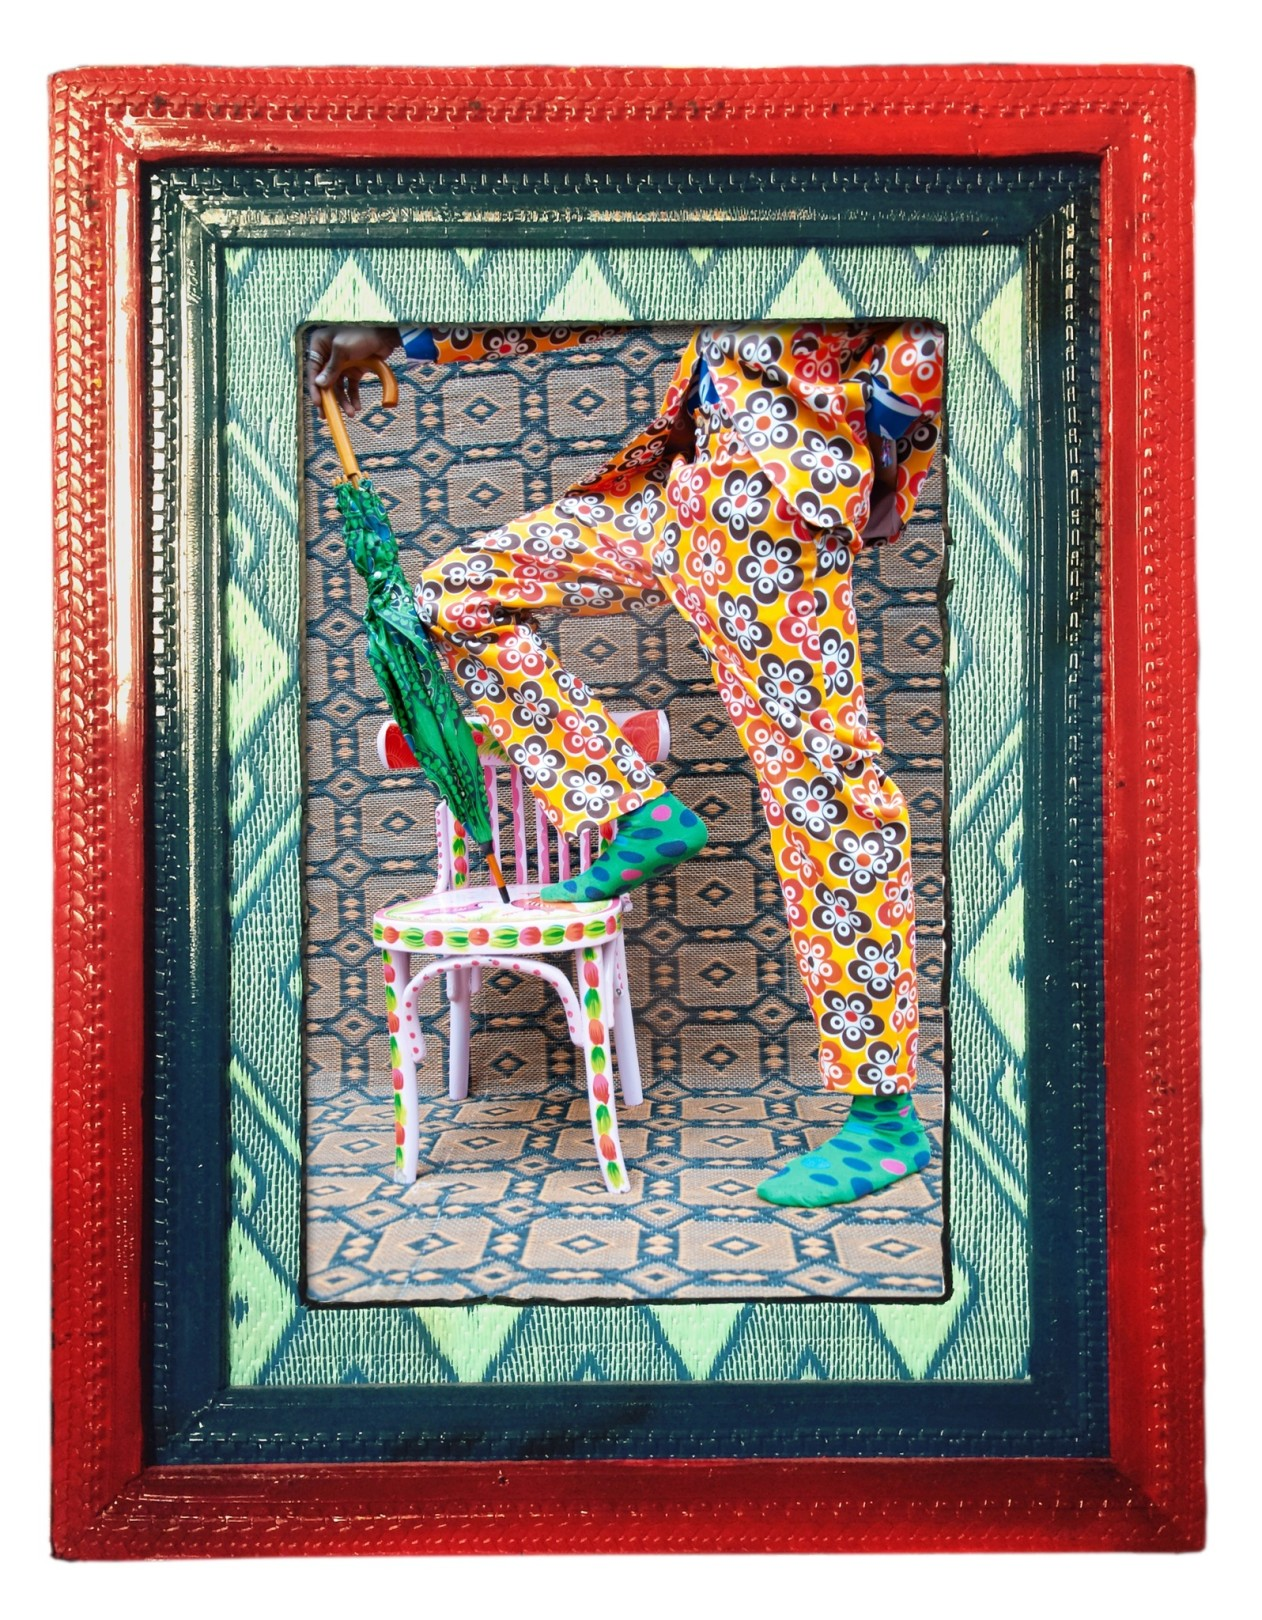 Hassan Hajjaj Simo Legs in Red, 2014/1435 Print: Metallic Lambda on 3mm dibond Frame: Wood, tyre, plastic mat & perspex Frame: 37.4h x 27.56w in / 95h x 70w cm Print: 29.53h x 19.69w in (75h x 50w cm) edition of 5 plus 2 artist's proofs